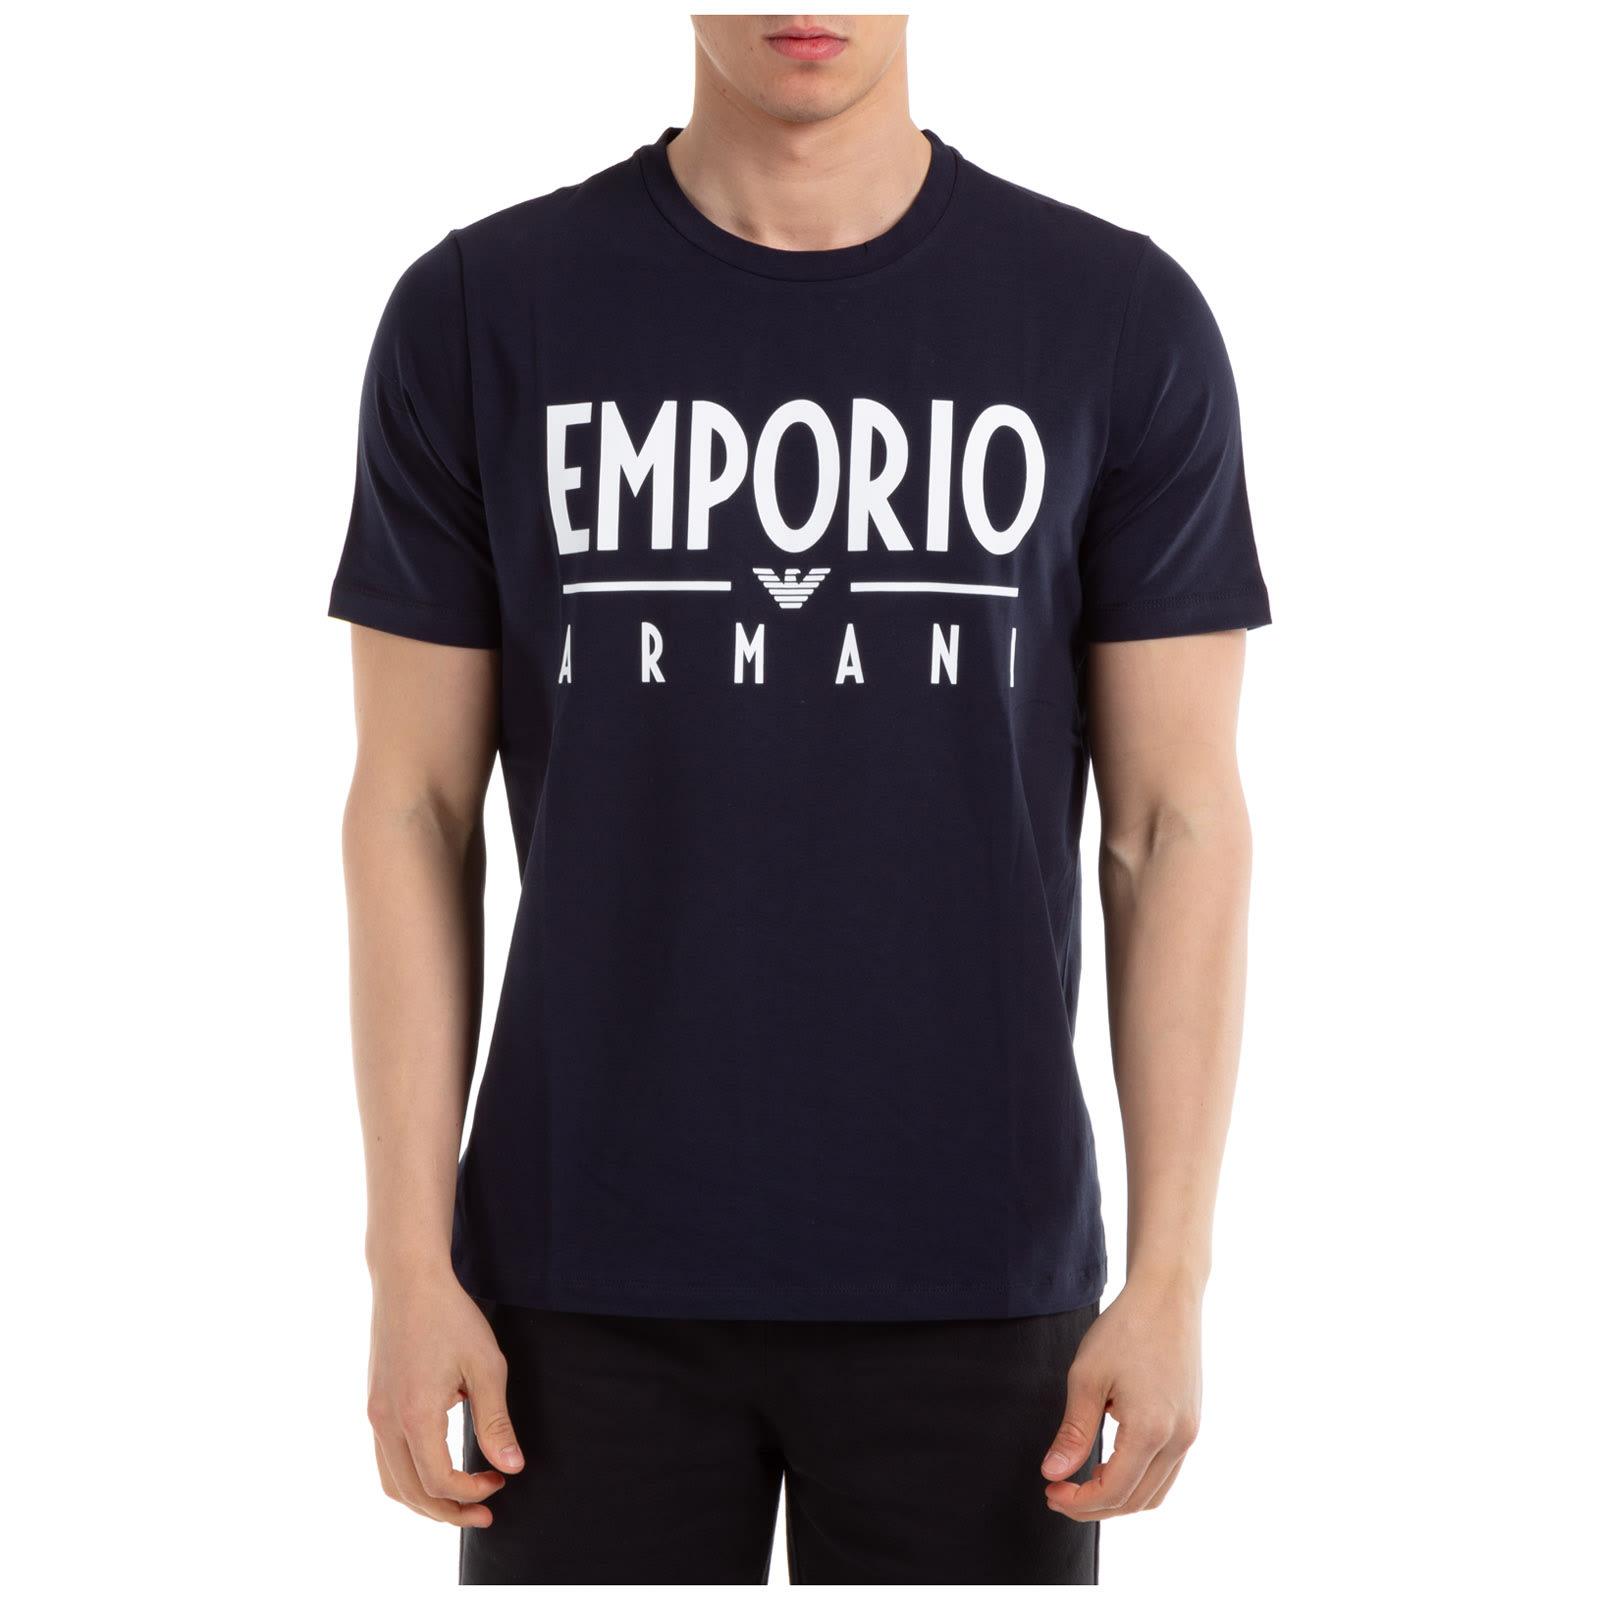 Emporio Armani Vevo T-shirt